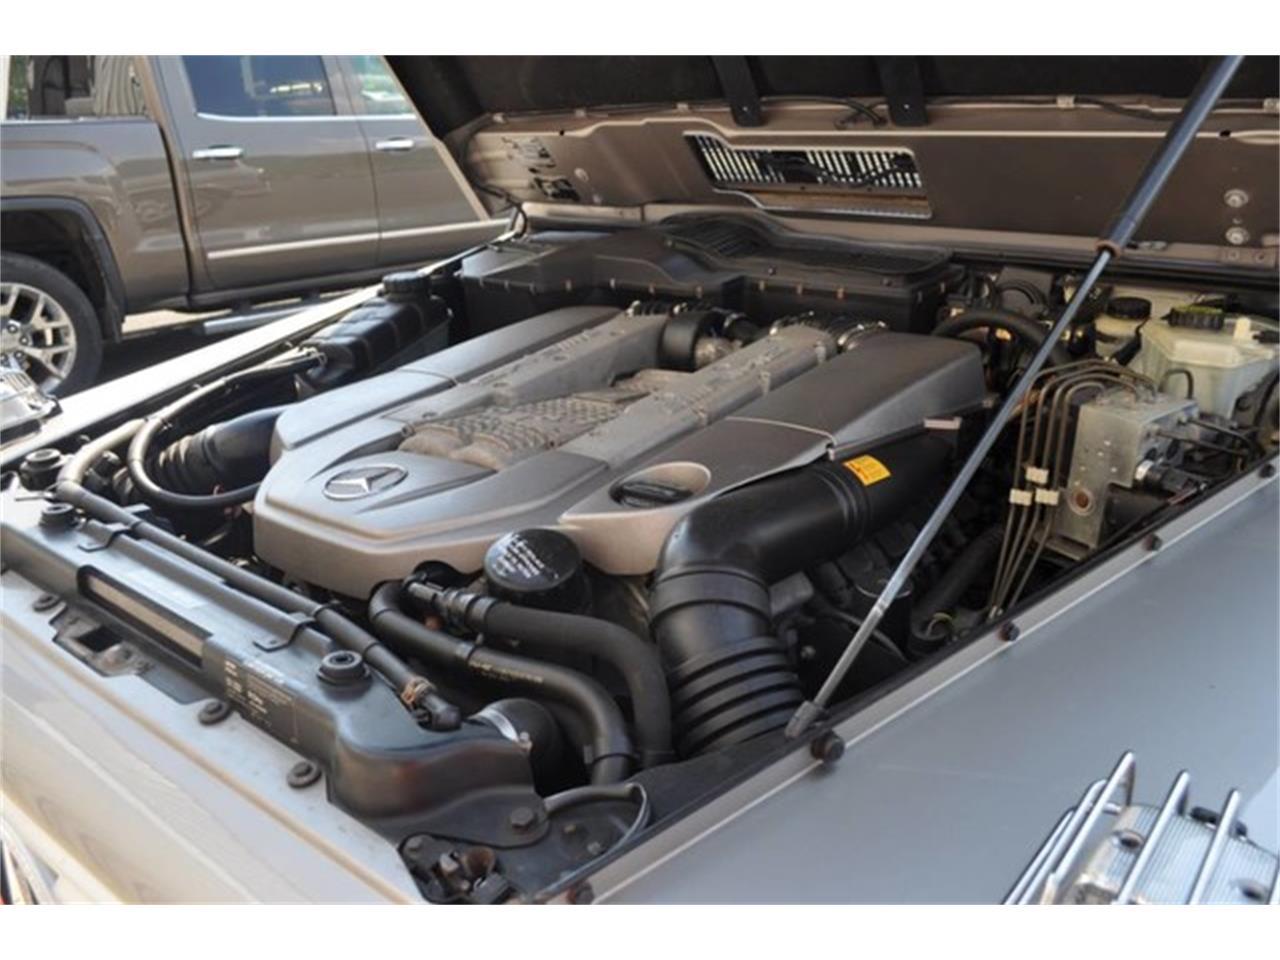 Large Picture of '05 Mercedes-Benz G-Class - $49,999.00 - LAKK